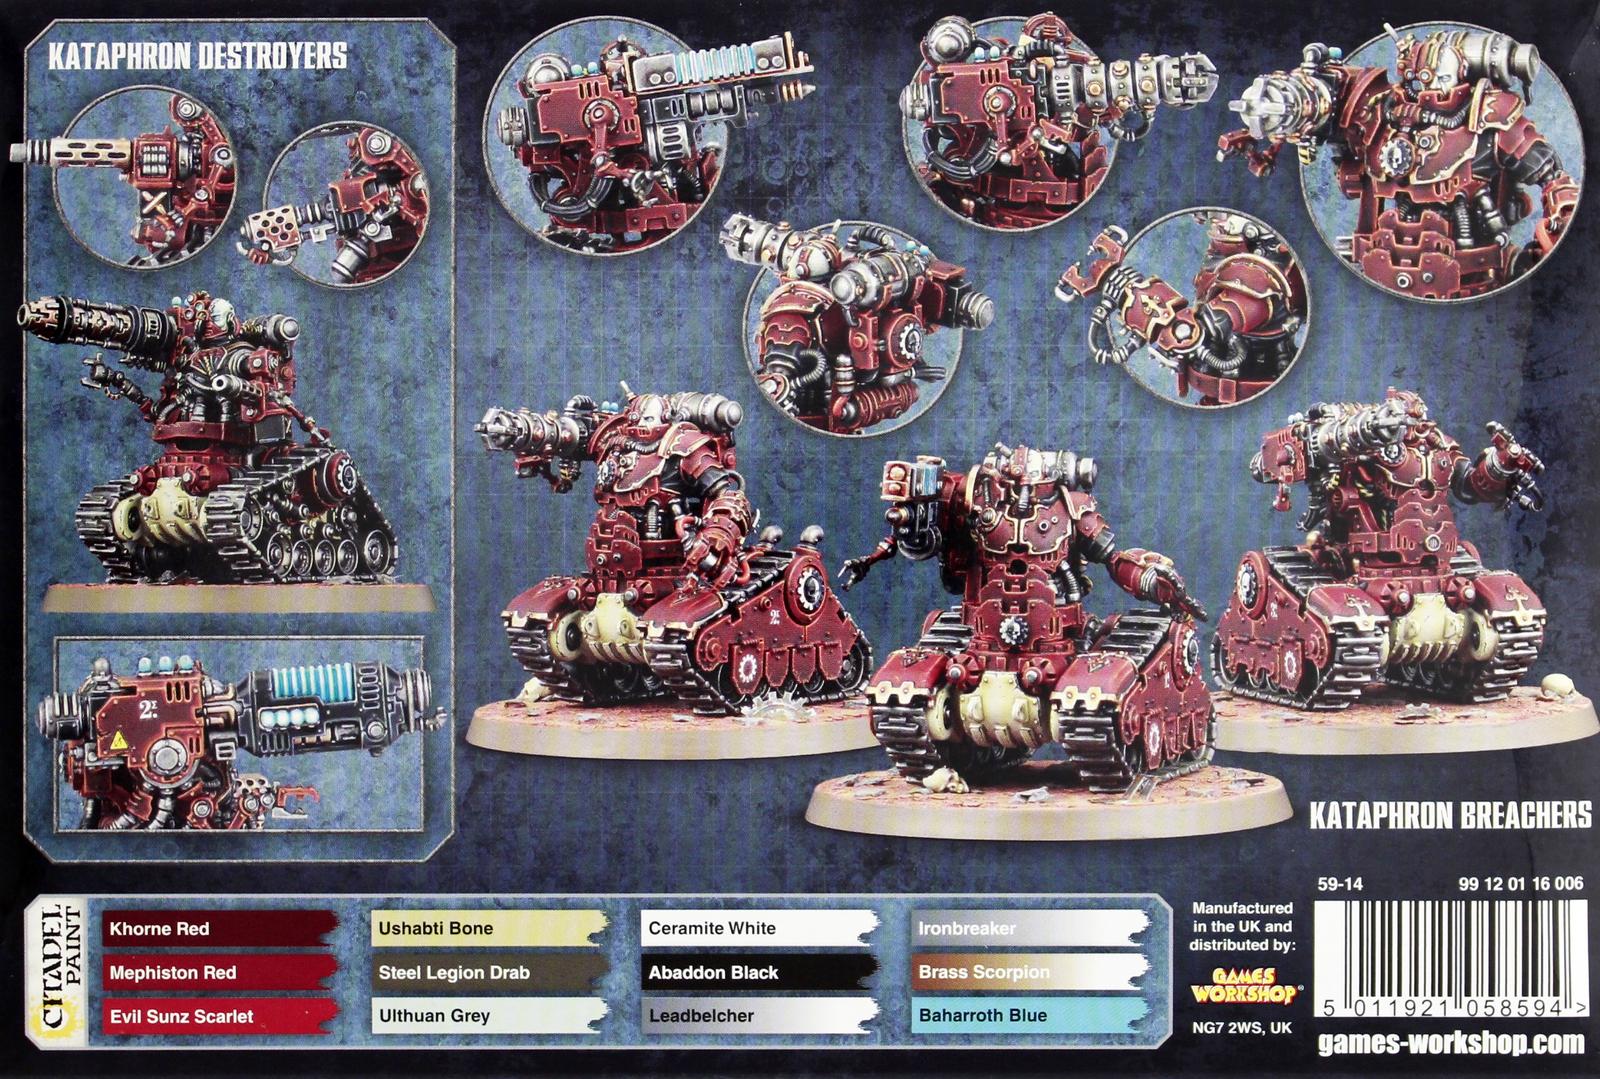 Warhammer 40,000 Adeptus Mechanicus Kataphron Battle Servitors image